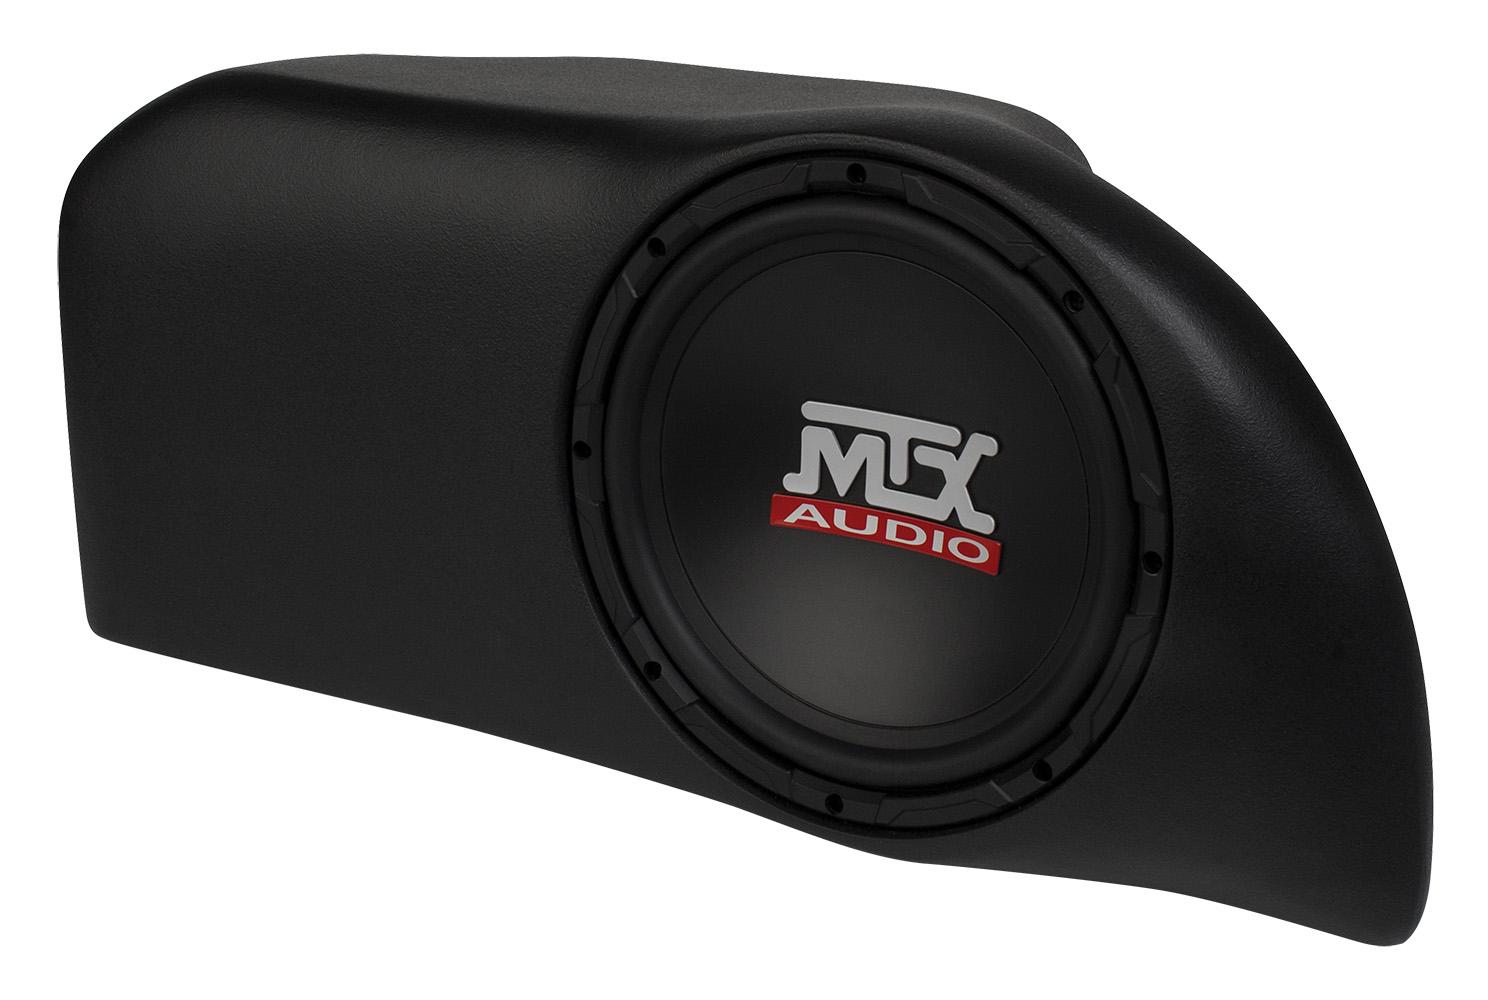 Scion FRS 2013+ ThunderForm Custom Subwoofer Enclosure | MTX Audio -  Serious About Sound®